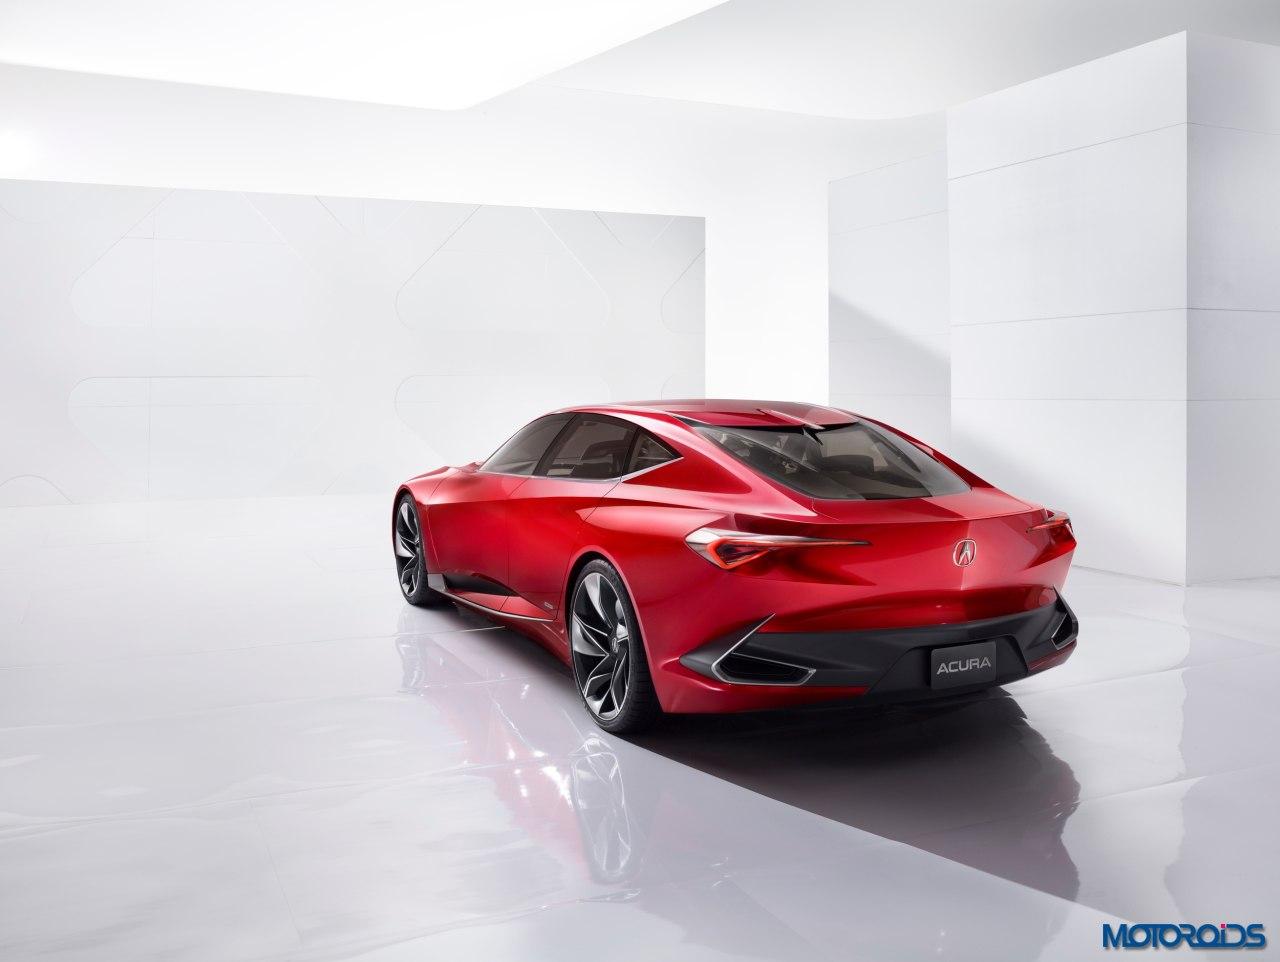 Acura Precision Concept Detroit Show 2016 (2)